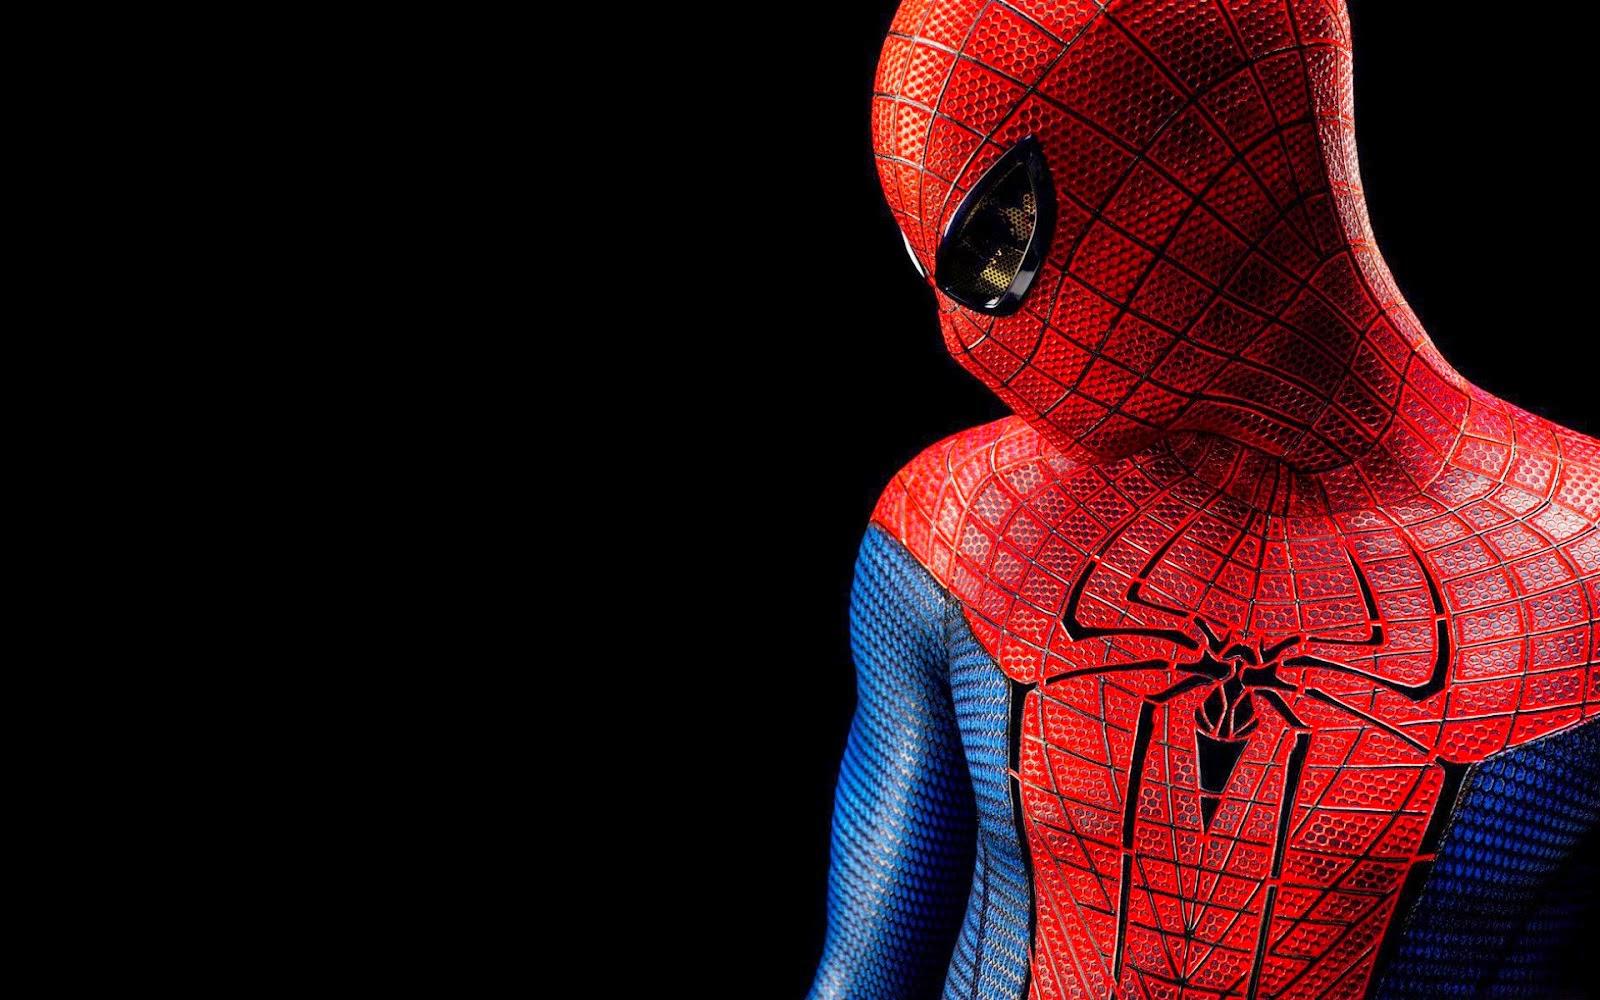 tải phim spider man 4 hd